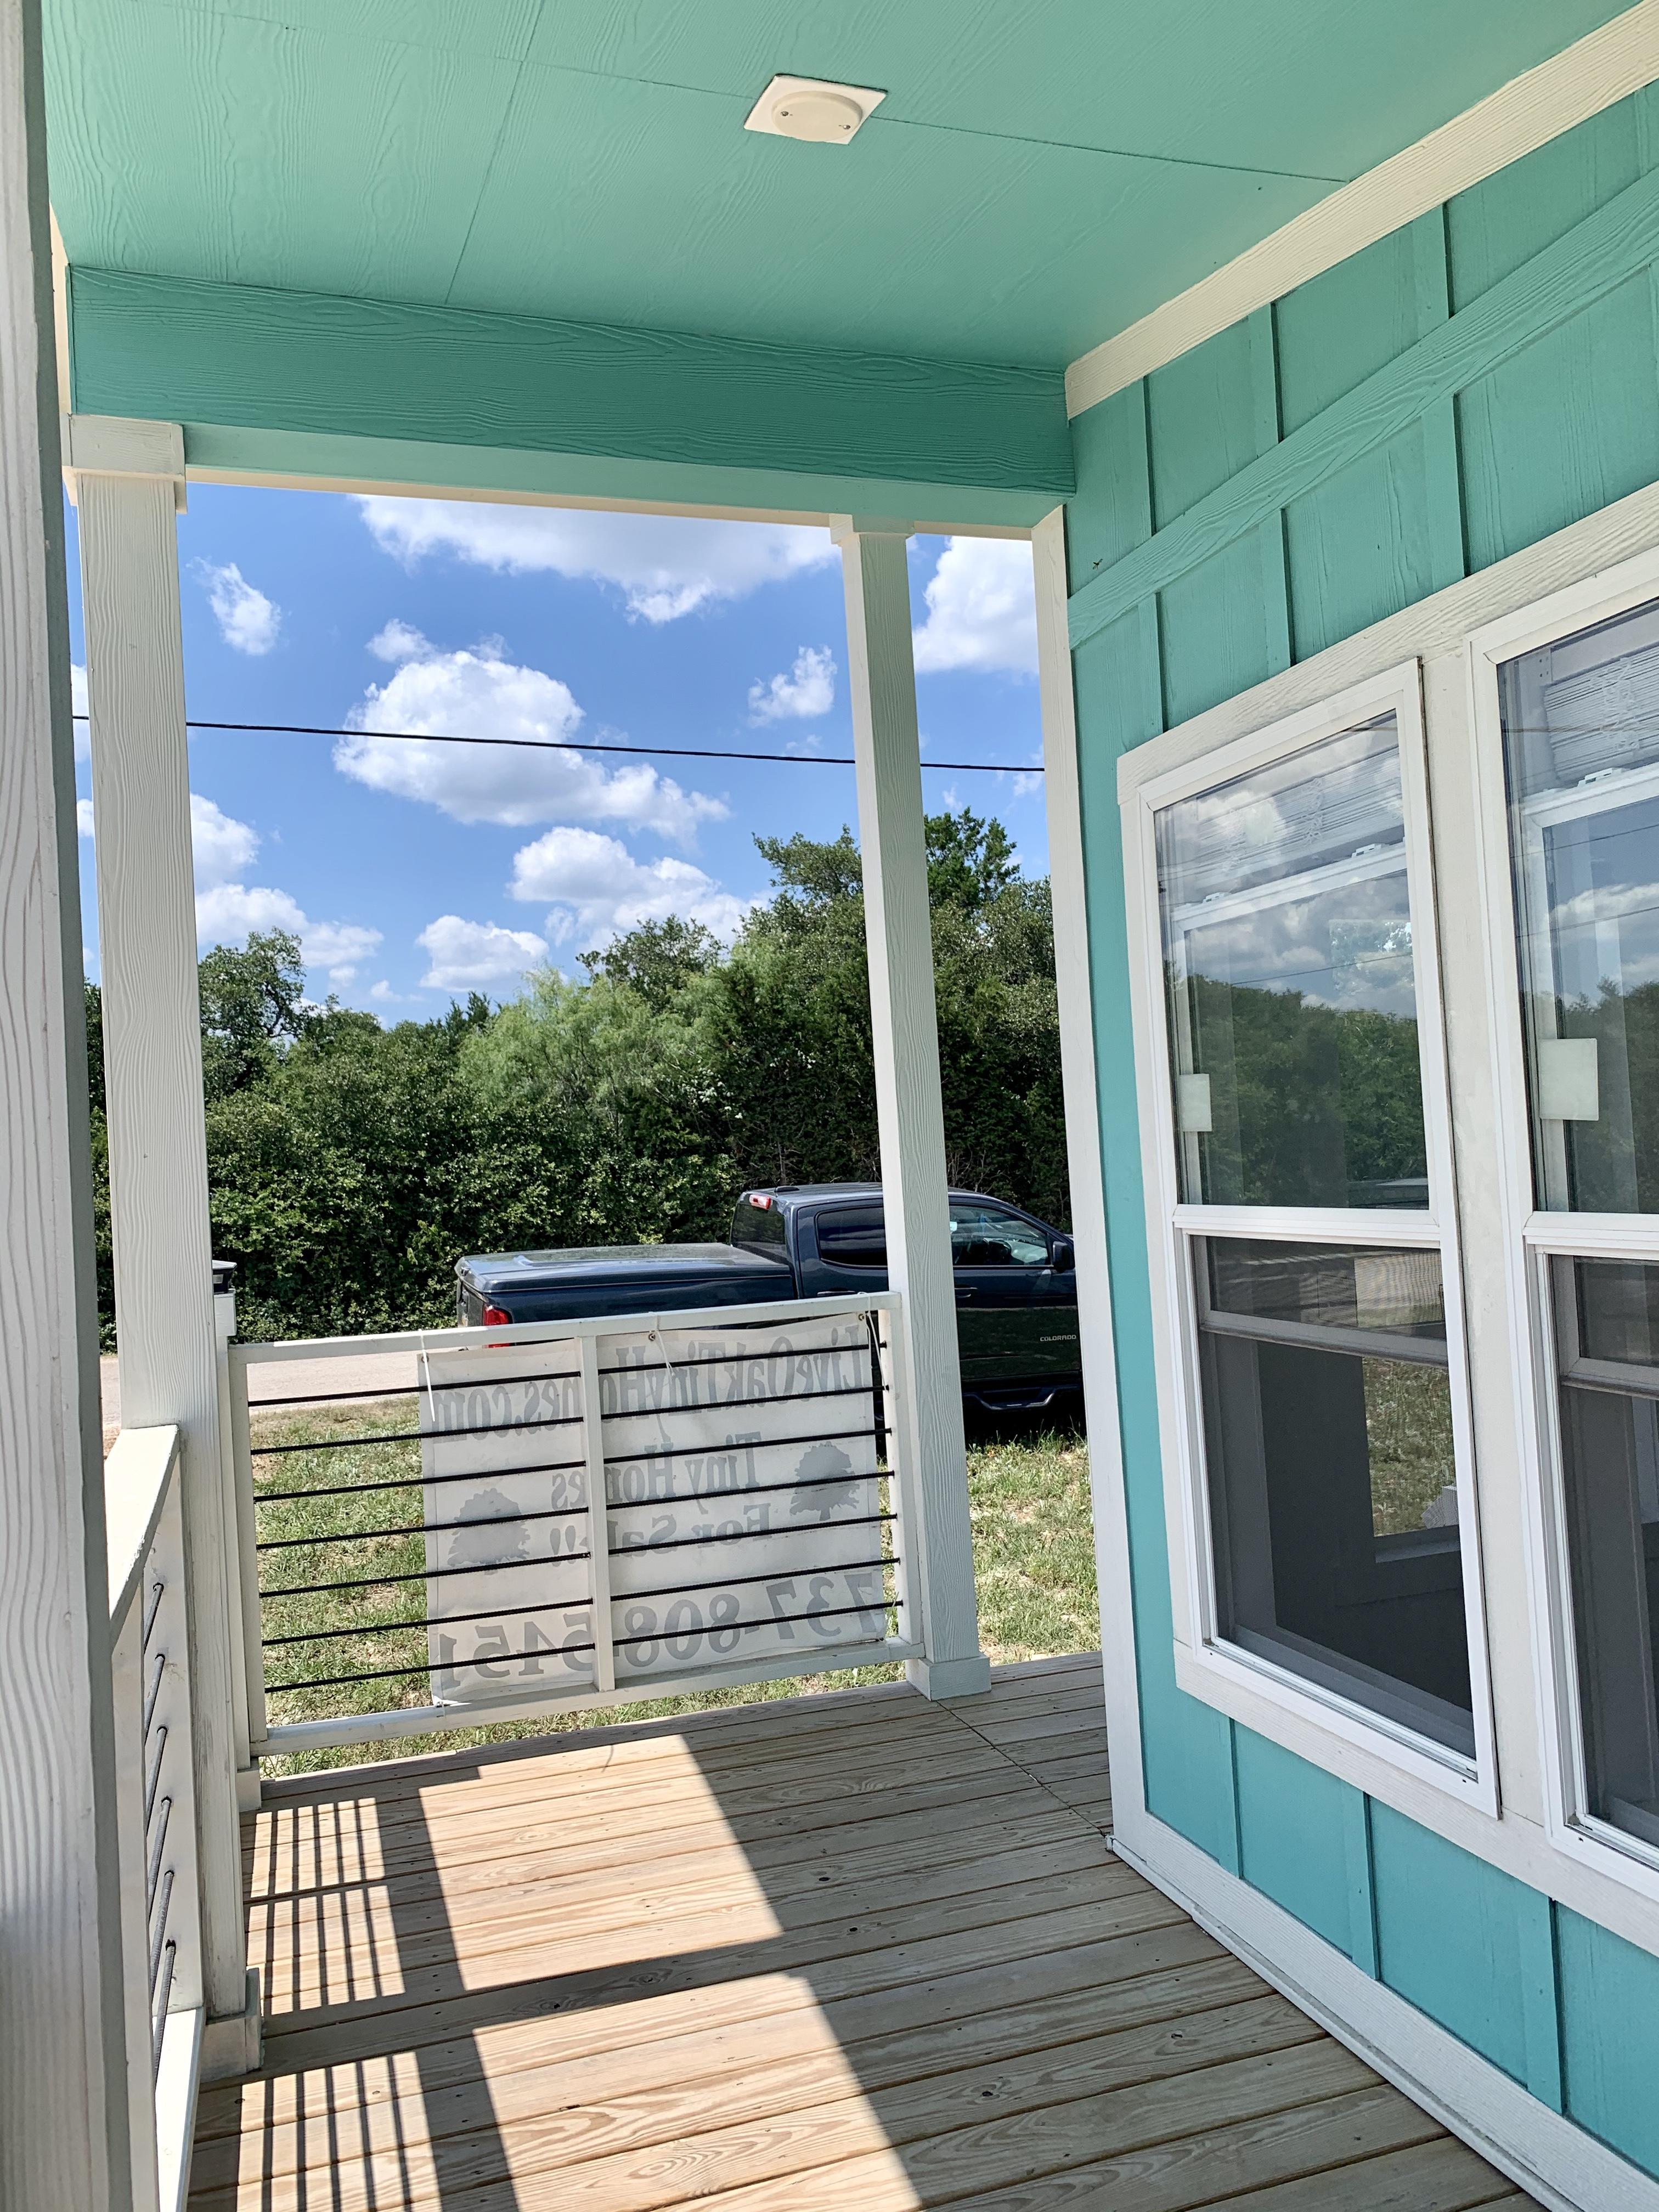 6ft side porch